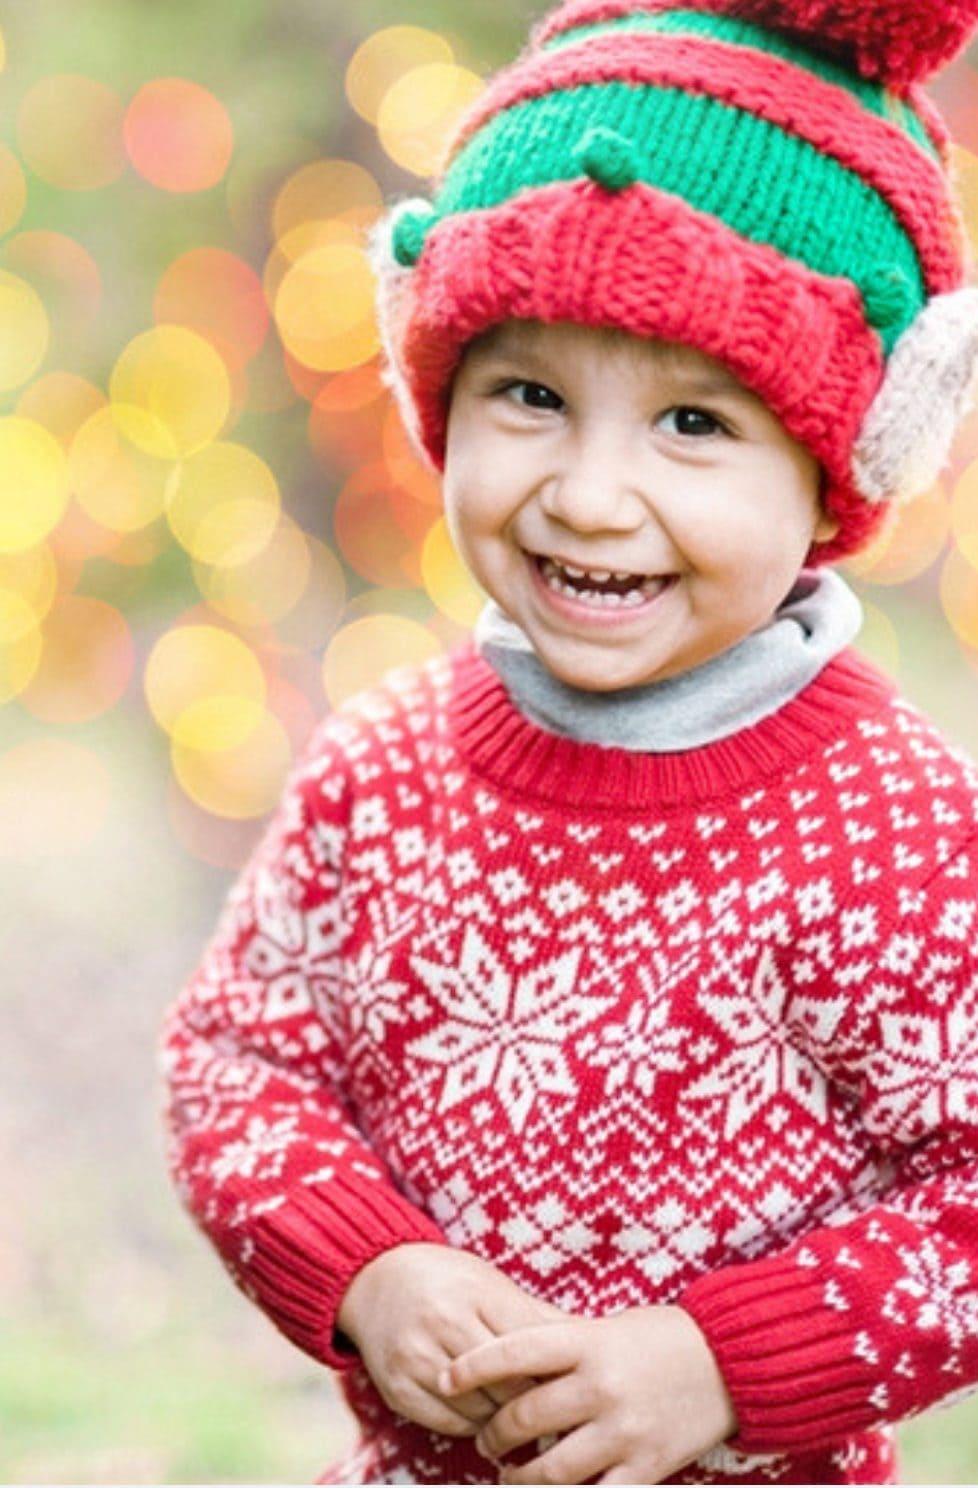 Christmas knits for kids